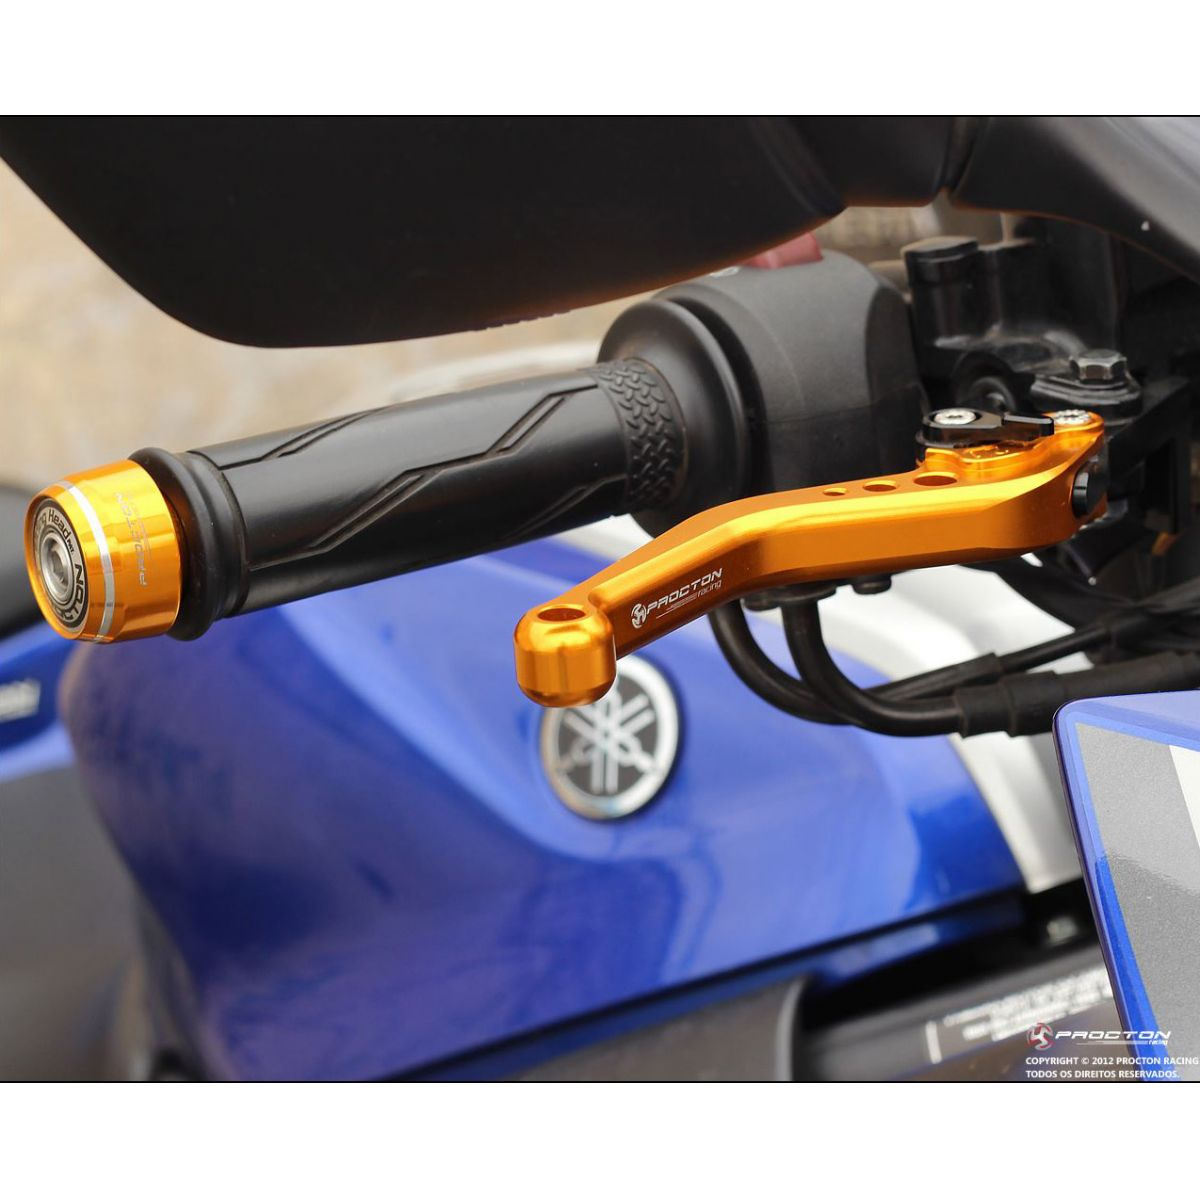 Manete Procton Racing GSXR1000 2008-2009 (F-35/S-14)  - Nova Suzuki Motos e Acessórios